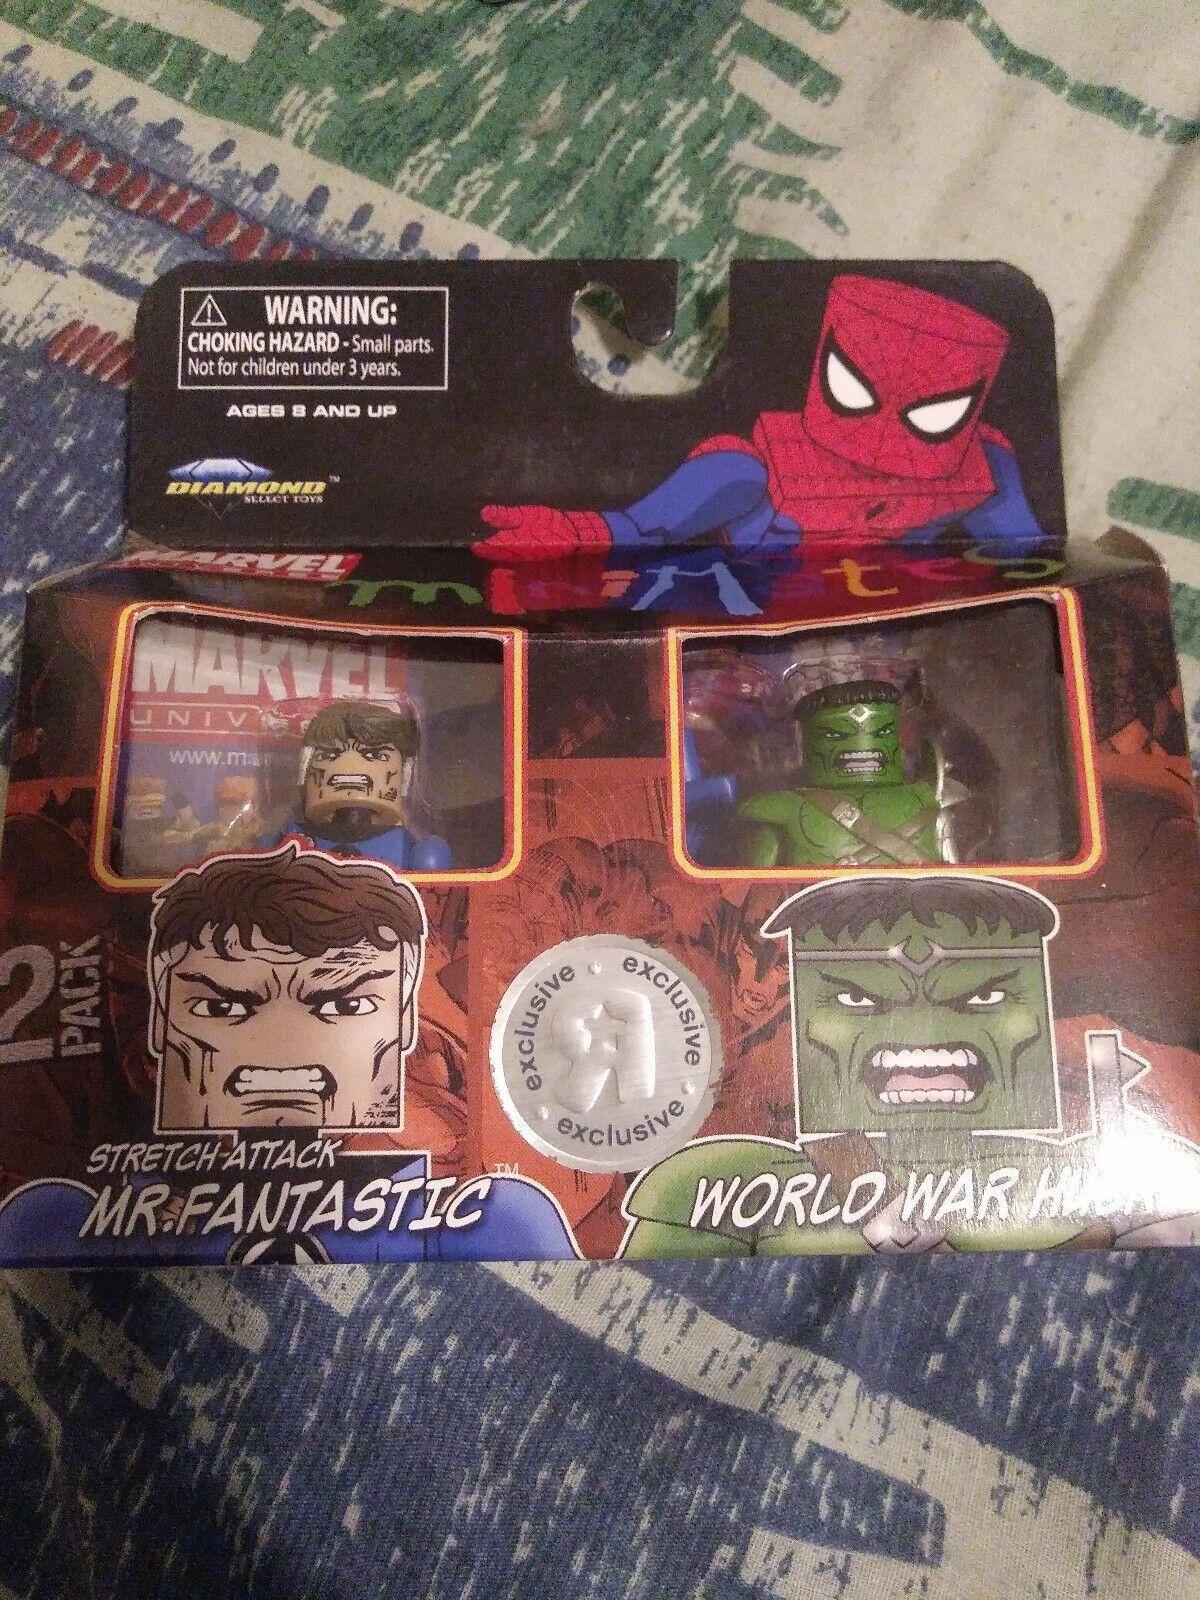 World War Hulk Fantastic Marvel Minimates Toys R Us Wave 06 Stretch Attack Mr